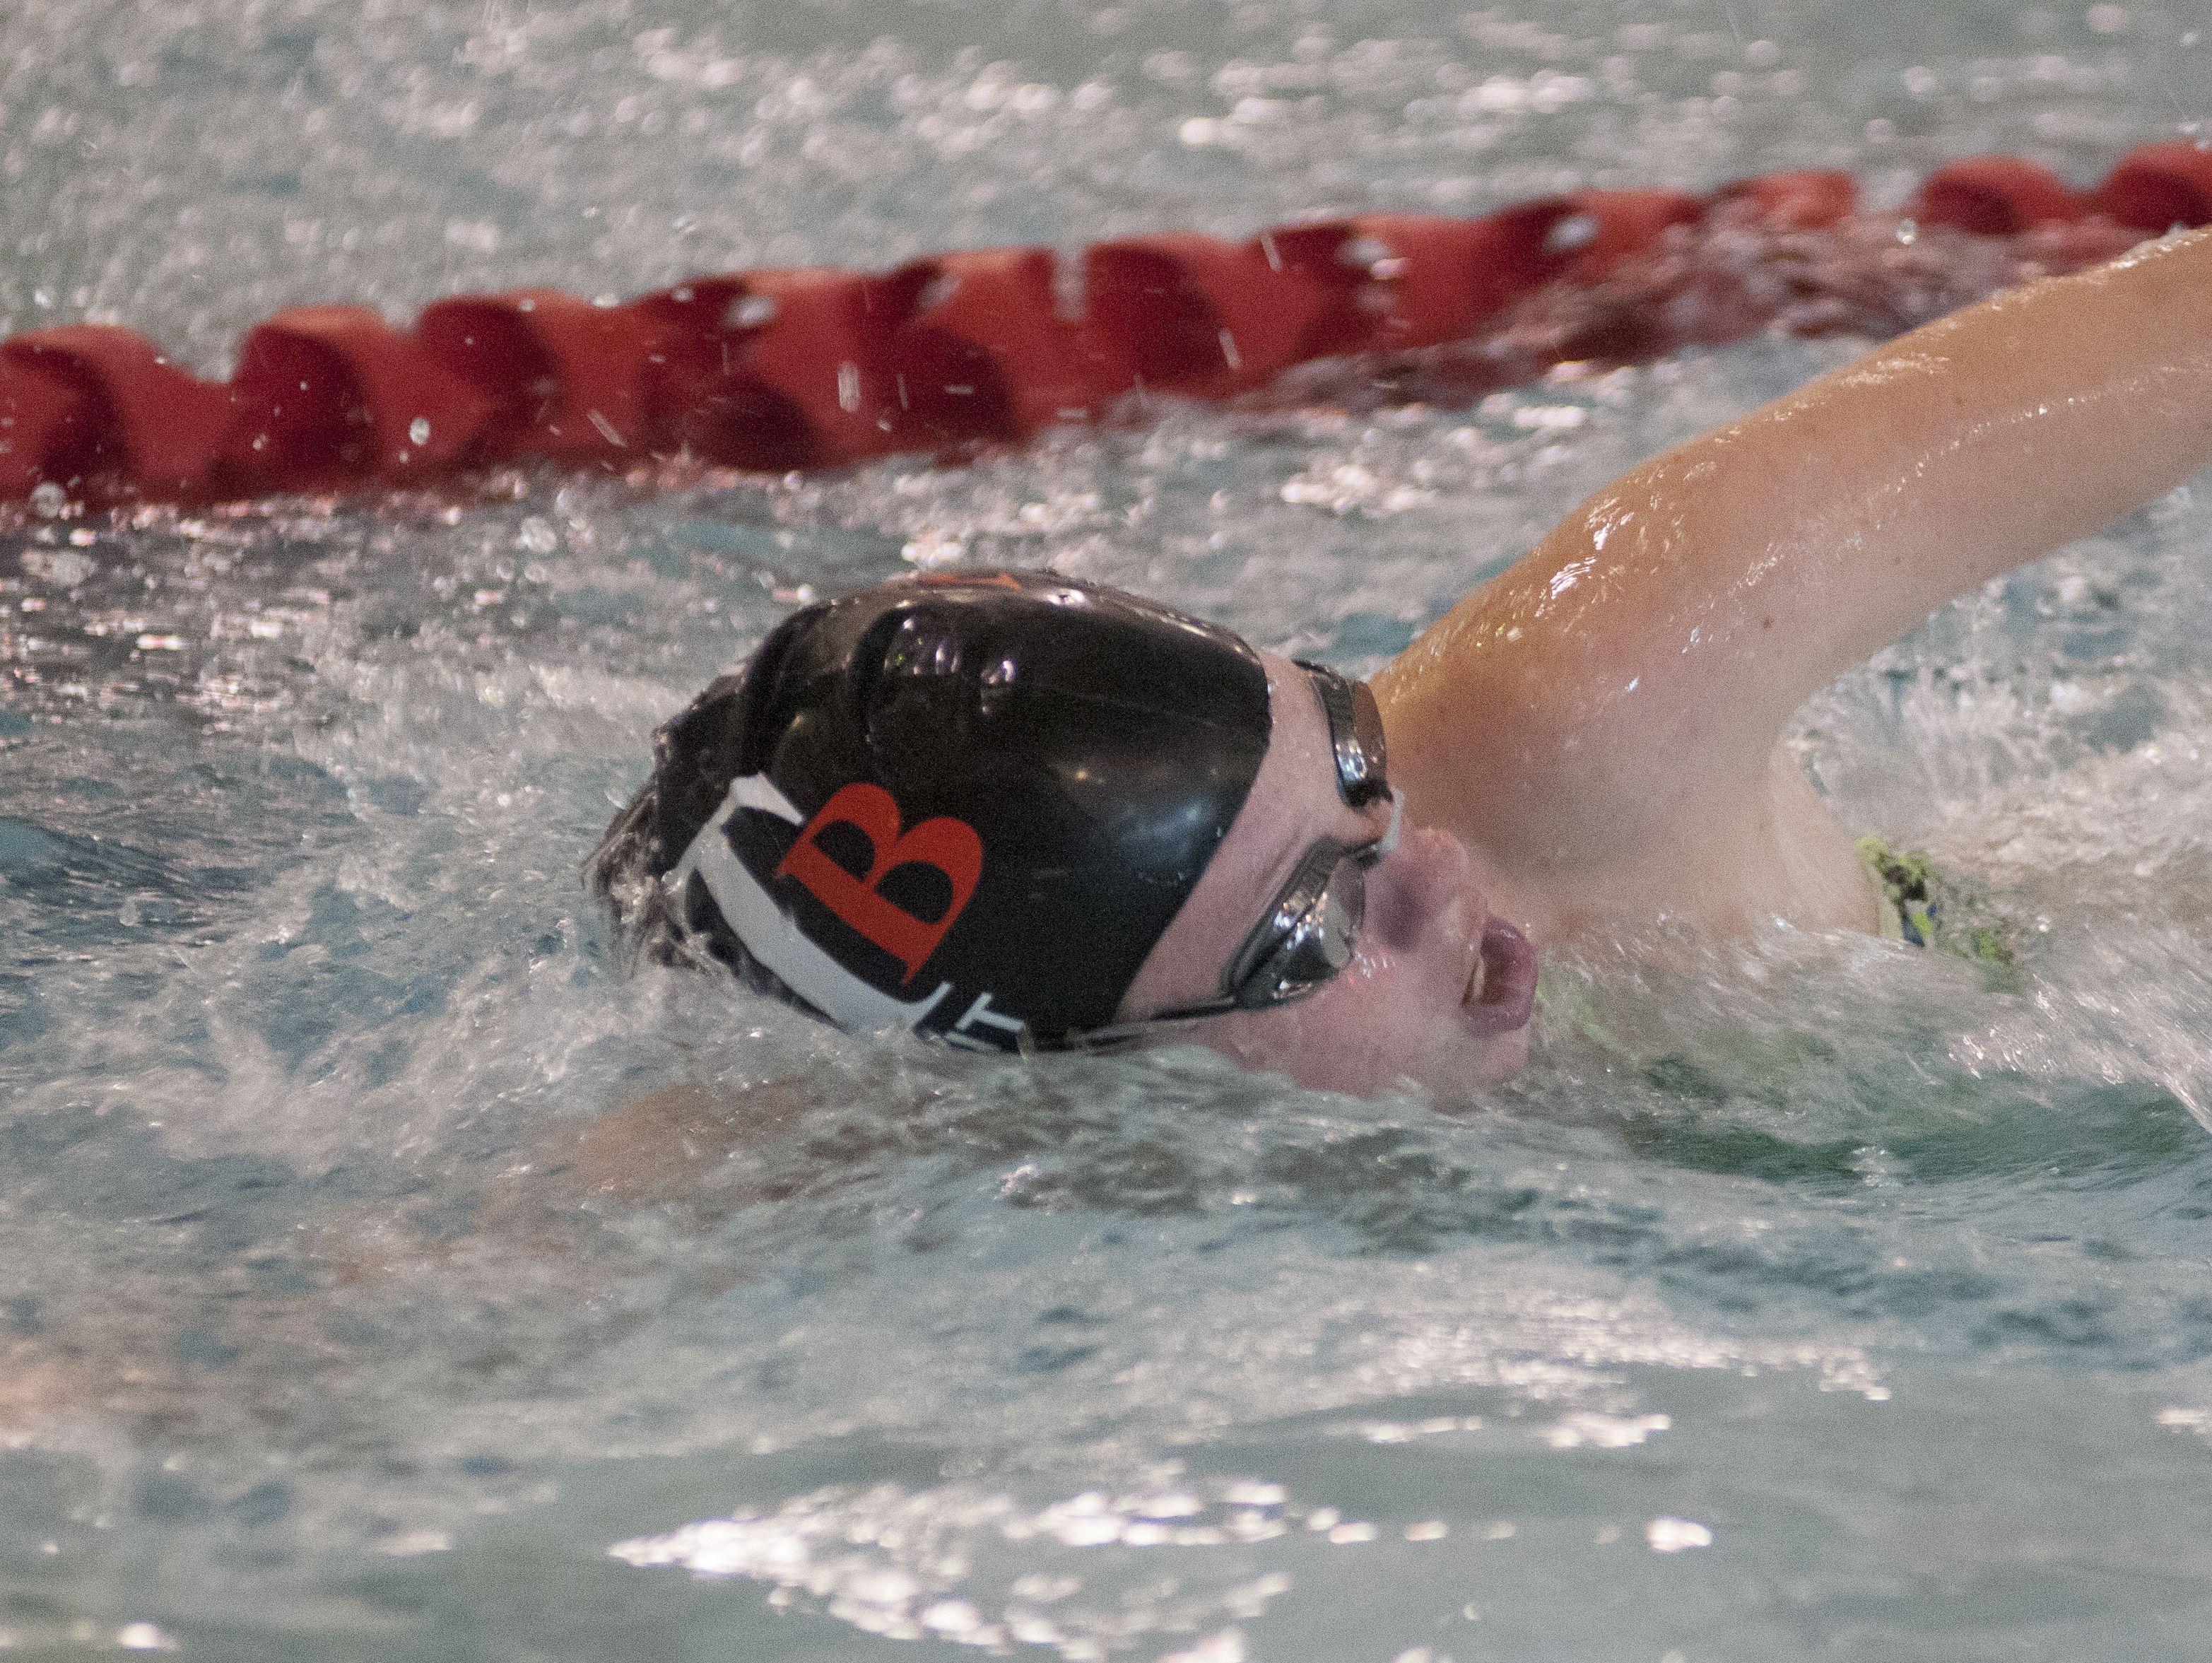 Riley Petit of Algonac swims laps Monday, Oct. 3, during swim practice at the Anchor Bay Aquatic Center.